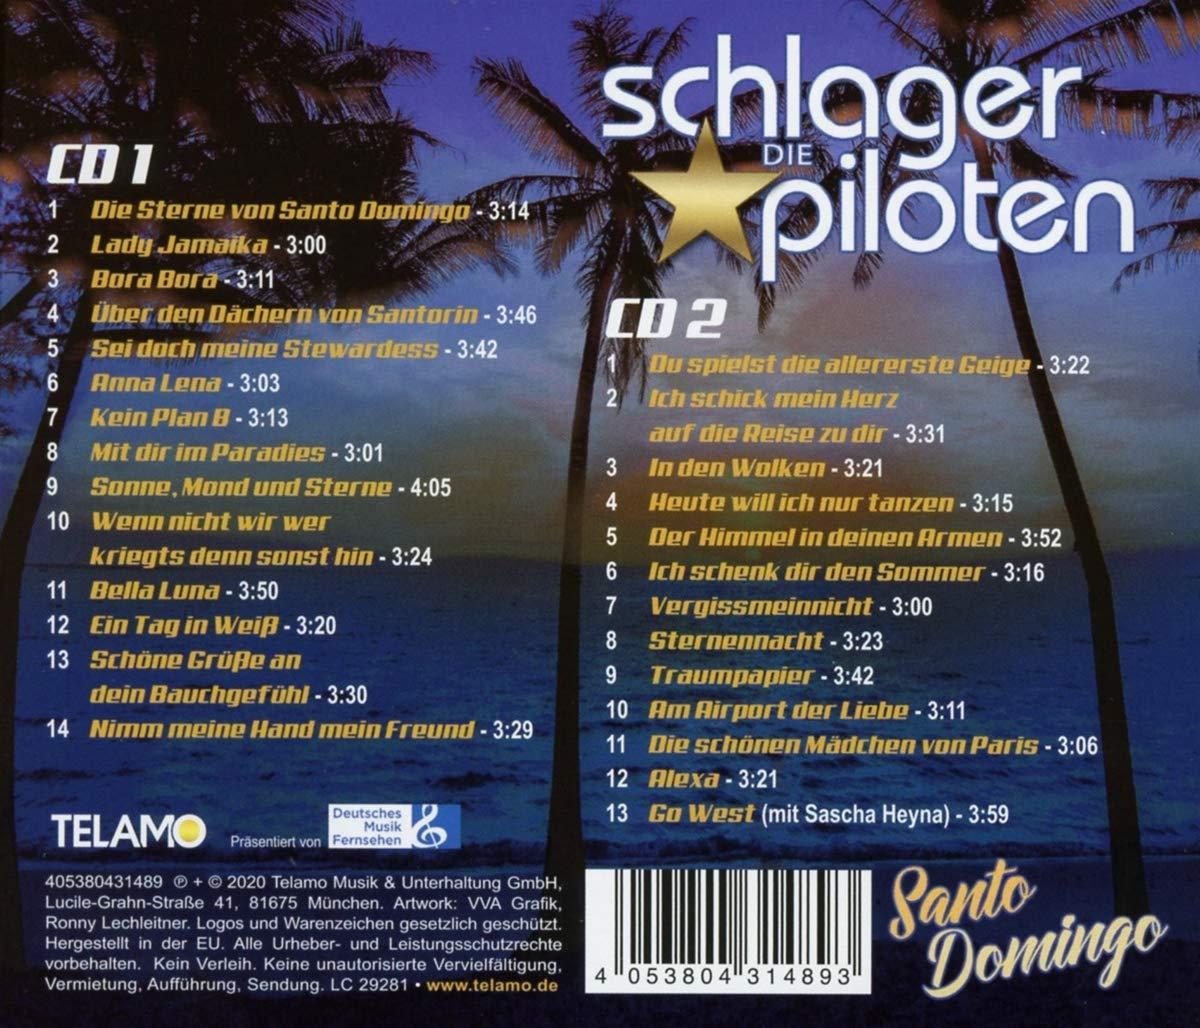 Die Schlagerpiloten - Santo Domingo (Deluxe Edition) (2020)